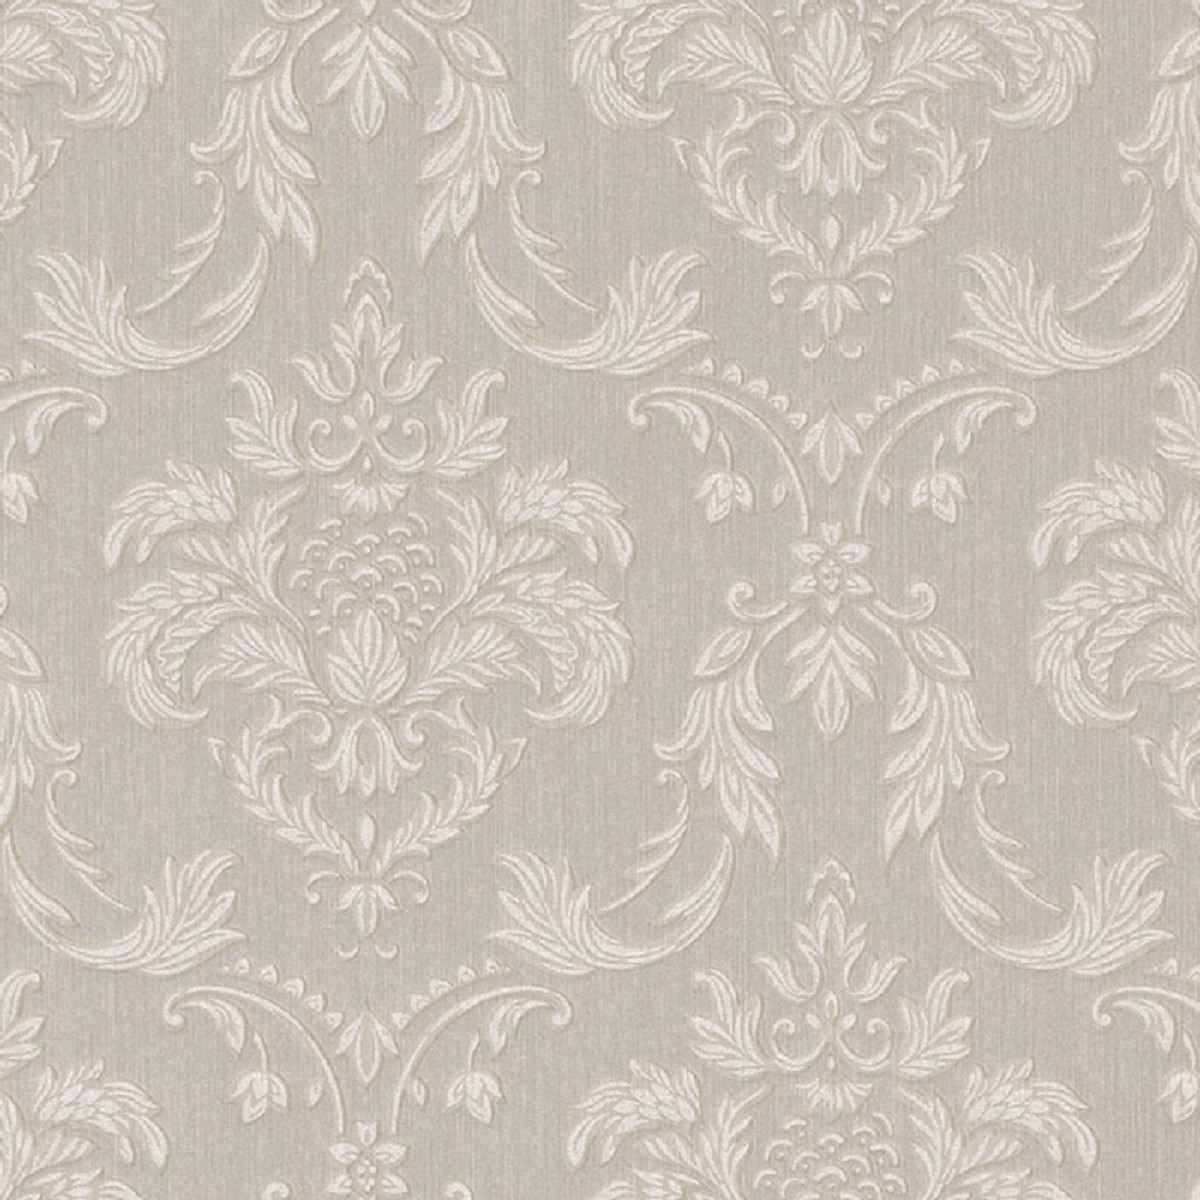 Full Size of Casa Padrino Barock Textiltapete Grau Wei Beige 10 Led Beleuchtung Wohnzimmer Pendelleuchte Wandtattoo Hängeschrank Weiß Hochglanz Tapeten Für Küche Wohnzimmer Wohnzimmer Tapeten